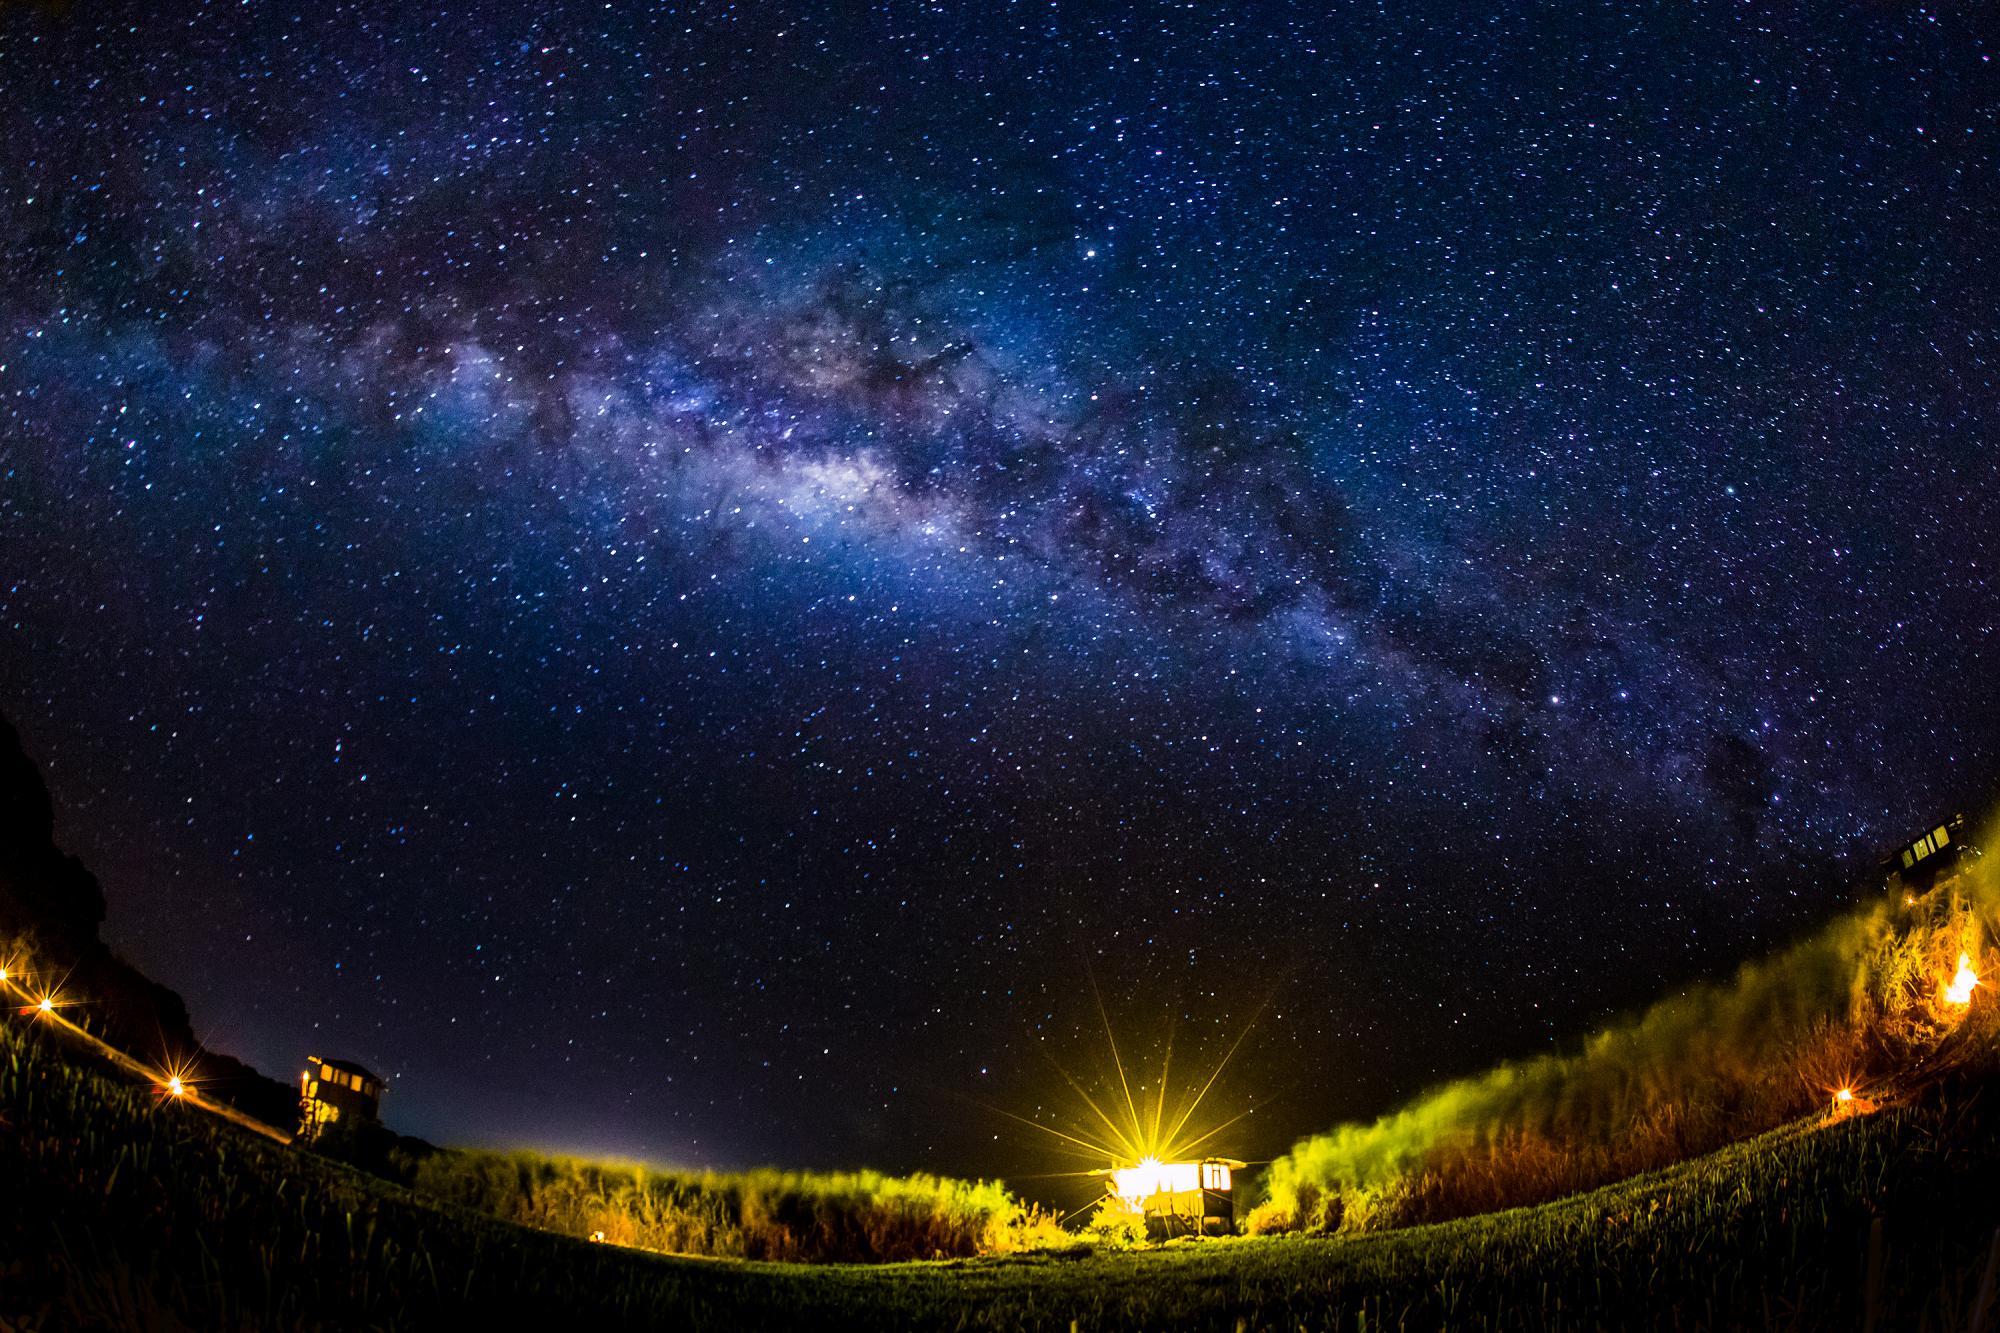 A Sneak Peek At The Galapagos At Night Night Sky Wallpaper Starry Night Wallpaper Night Sky Hd